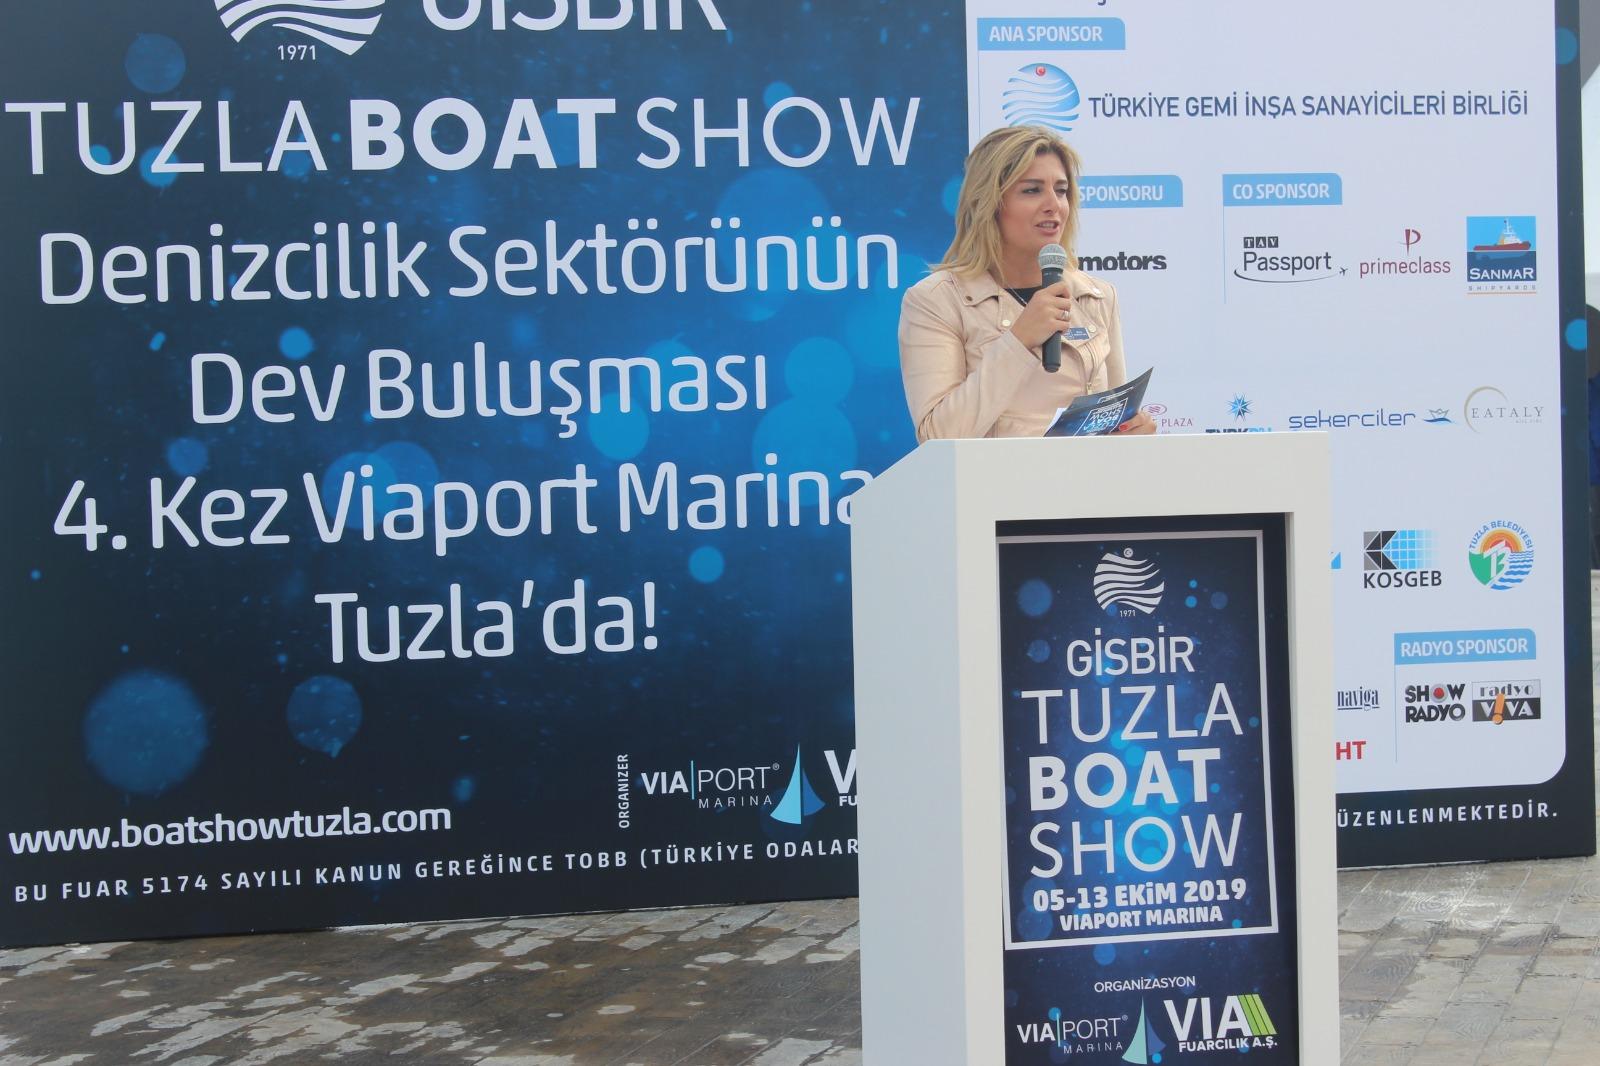 boat-show9.jpg